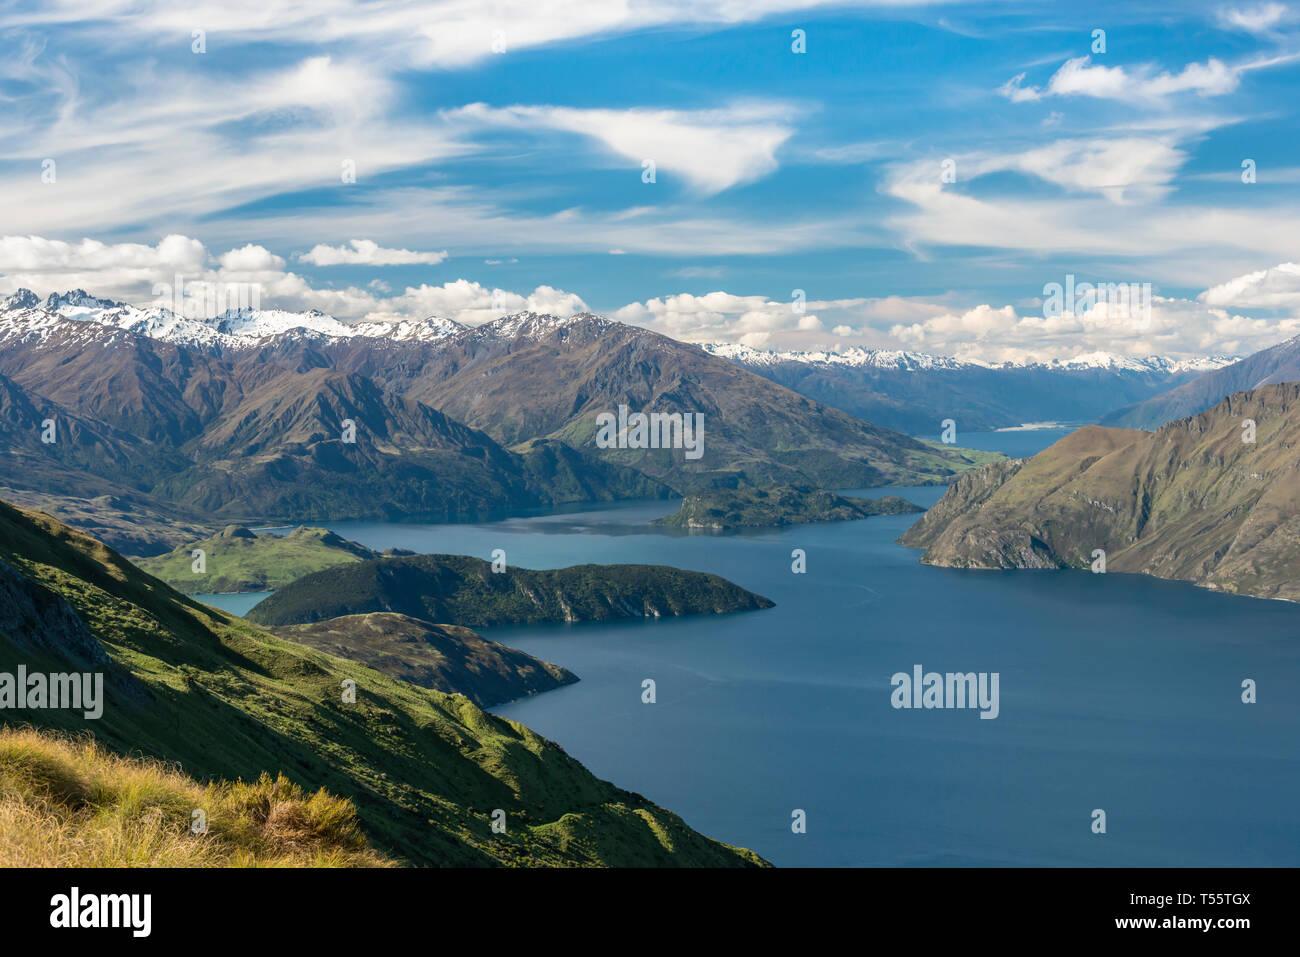 Mountains by Lake Wanaka in New Zealand Stock Photo